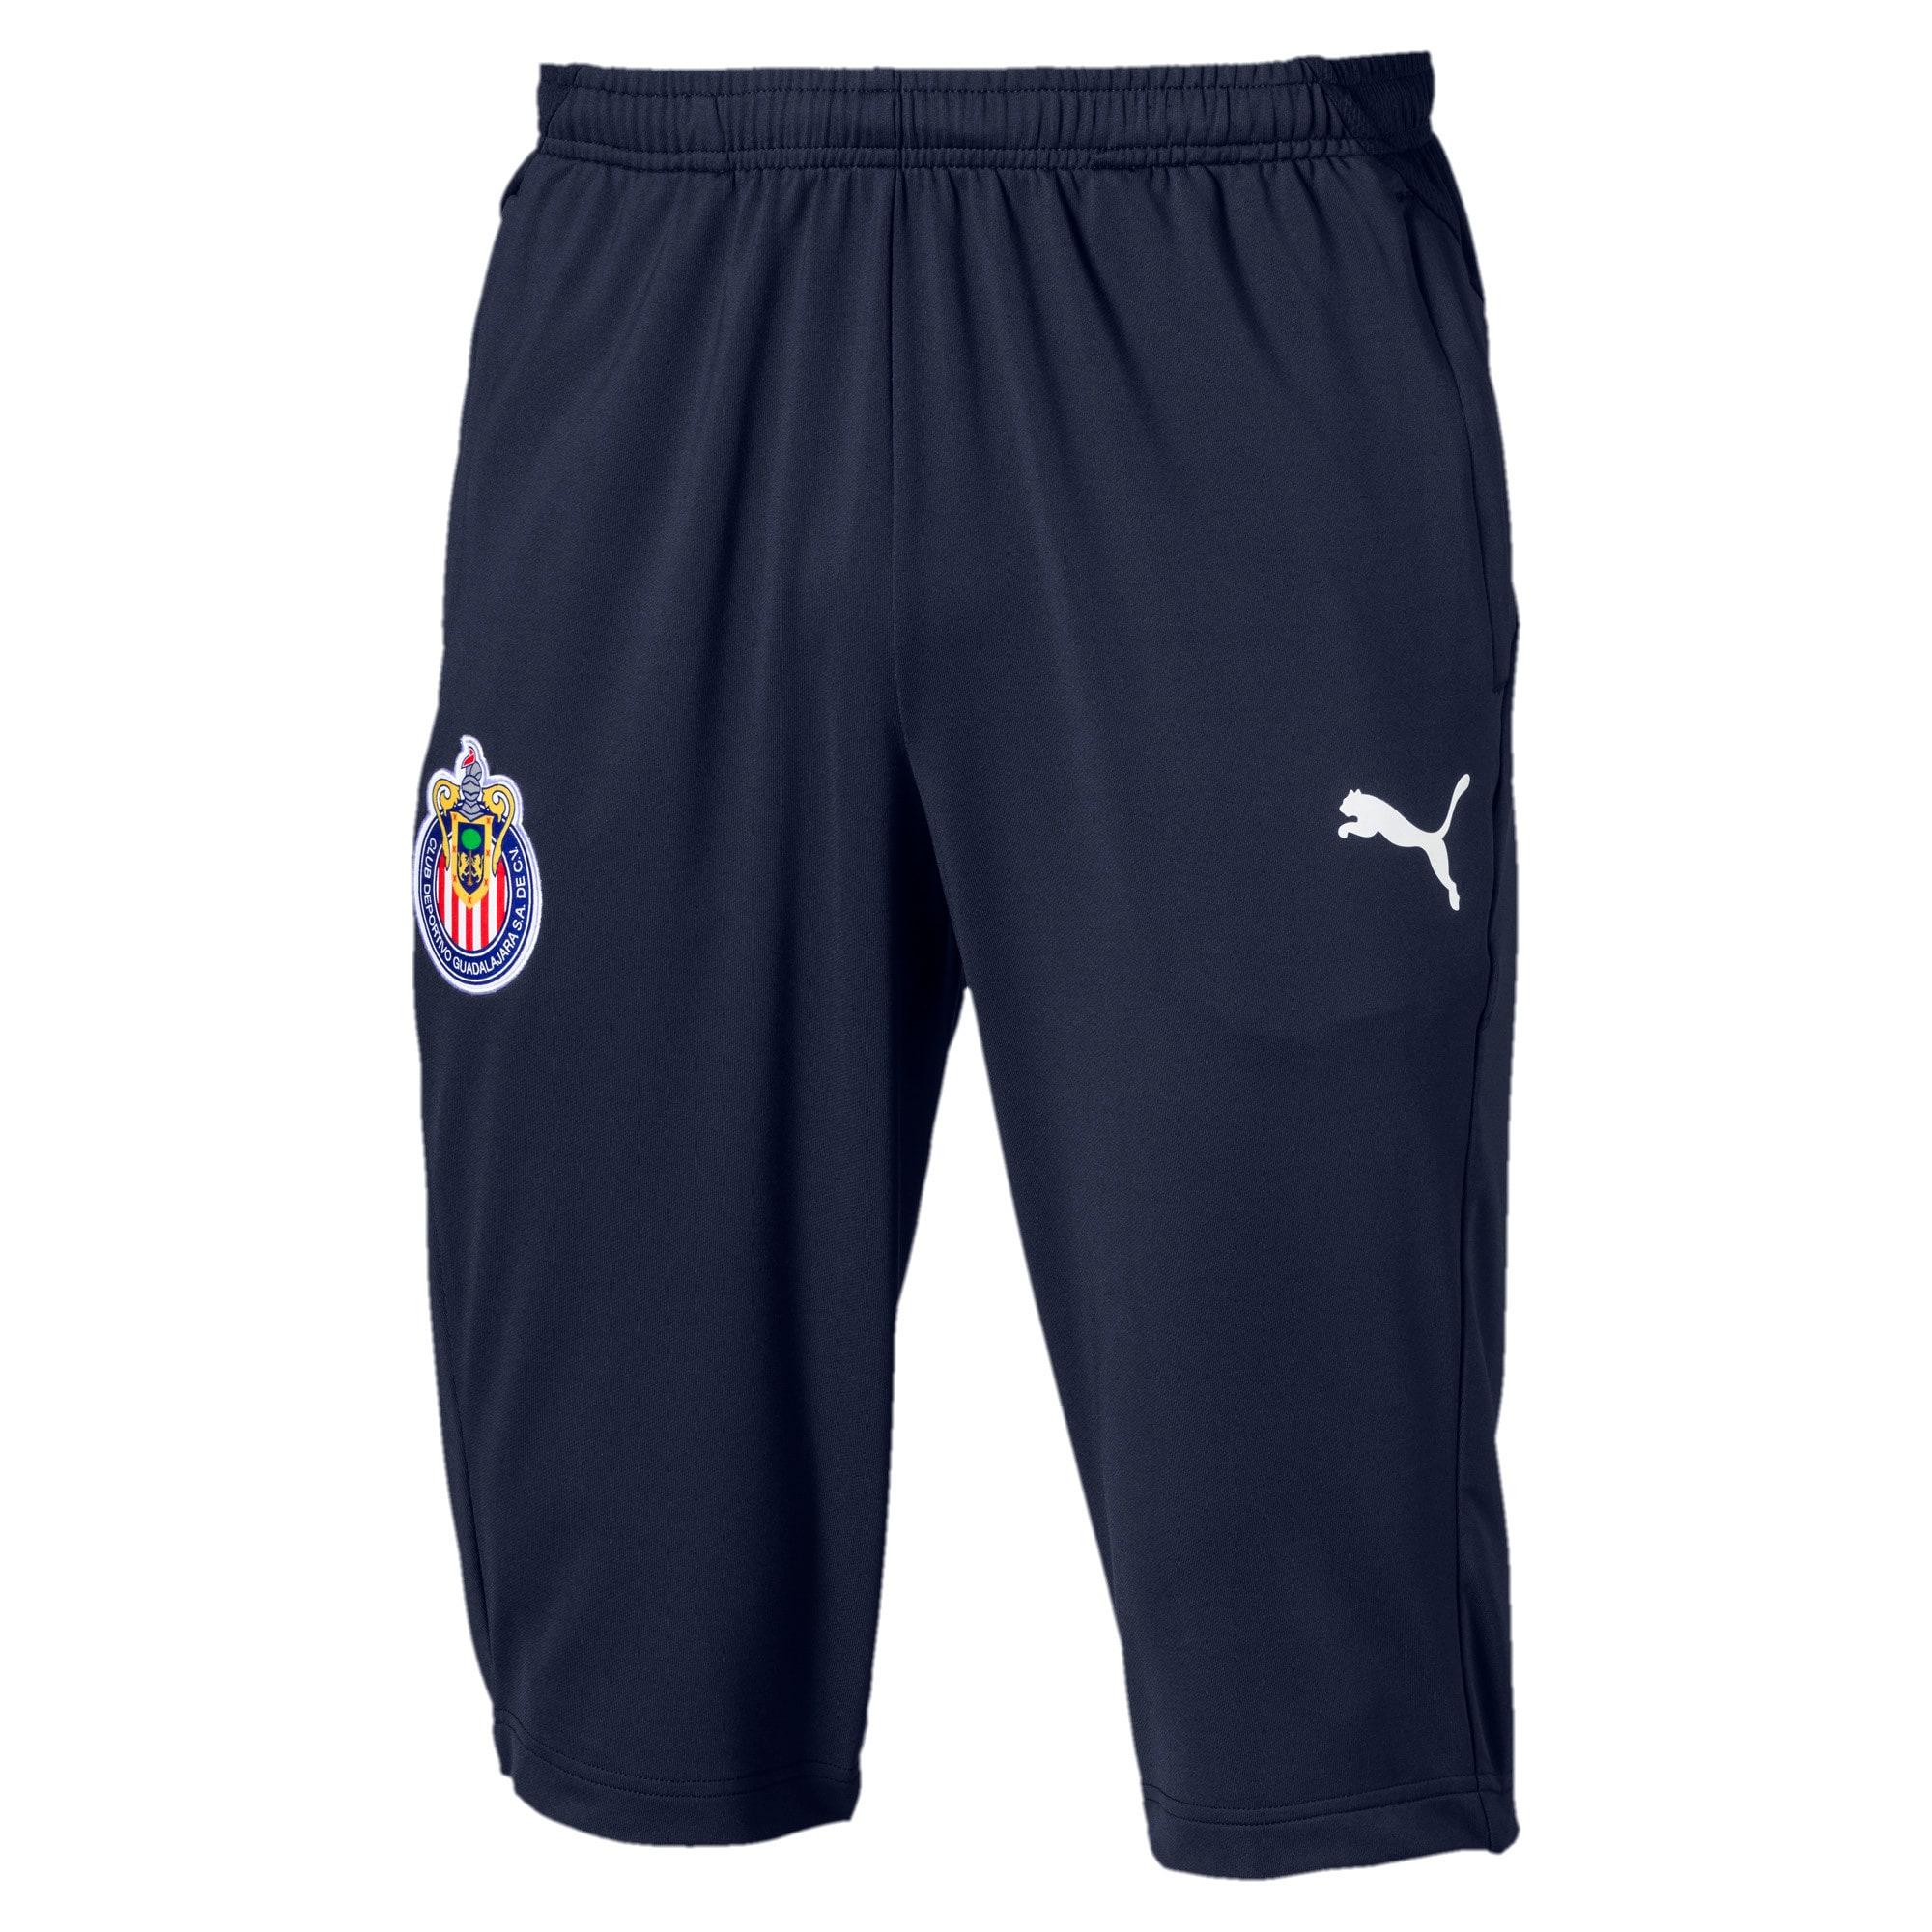 quality design f4e04 65fbc Chivas Men's 3/4 Training Pants